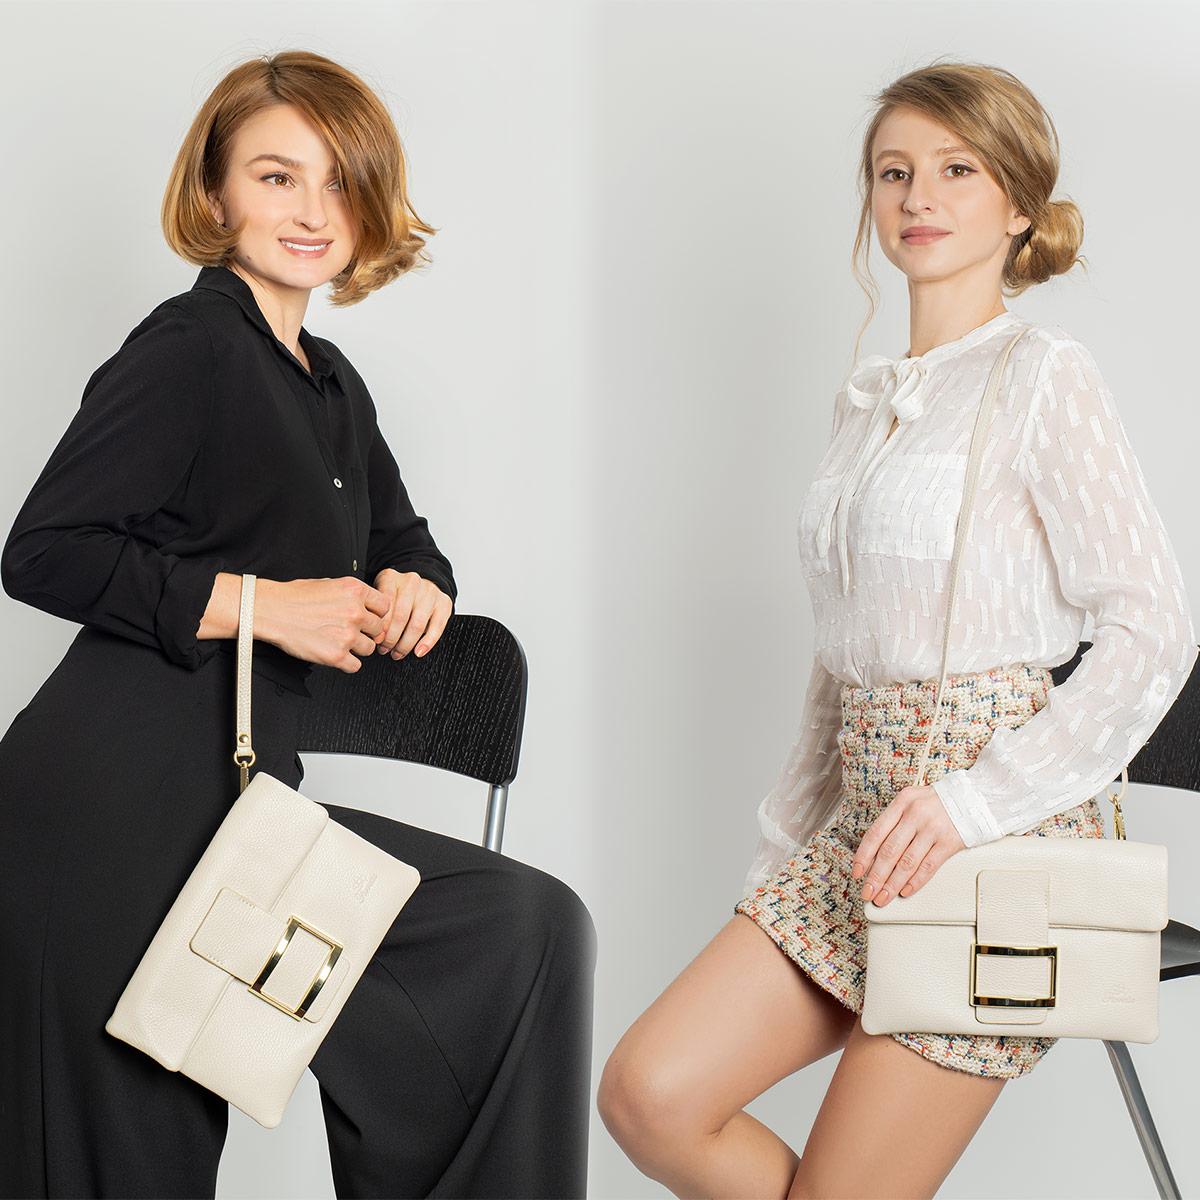 Fioretta Italian Genuine Leather Wristlet Crossbody Shoulder Bag Clutch Handbag For Women - Beige